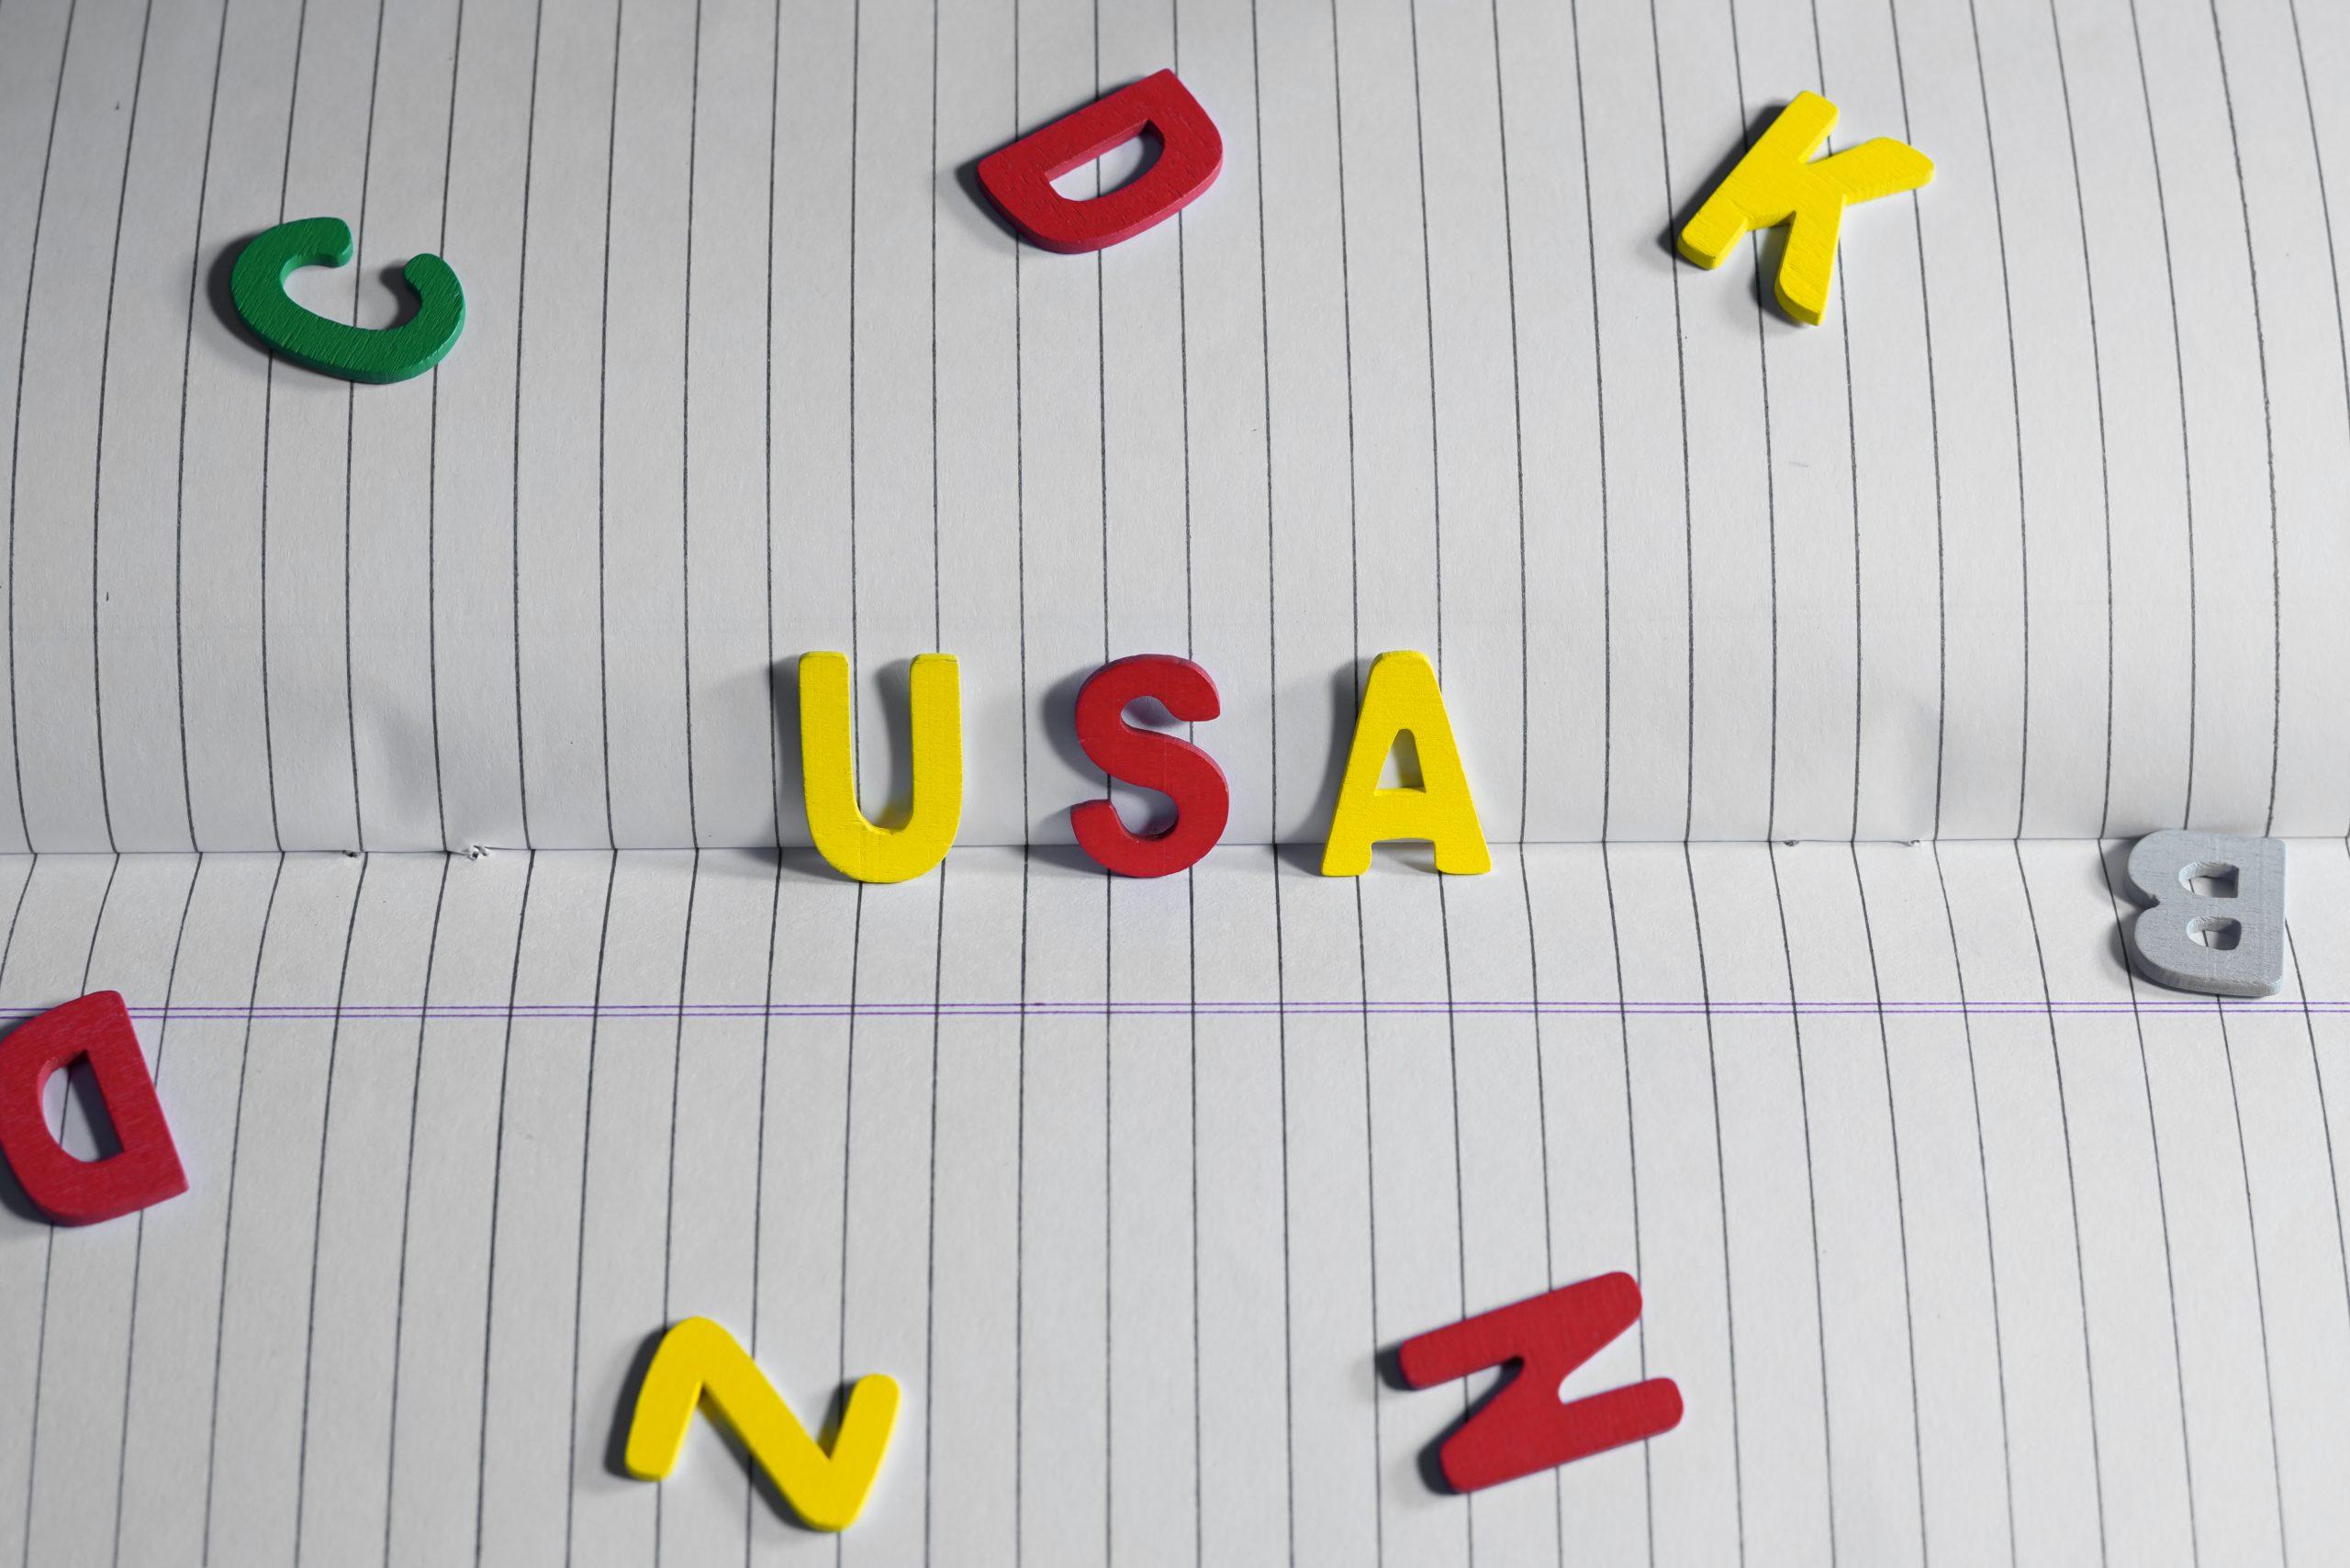 USA written with symbol keys